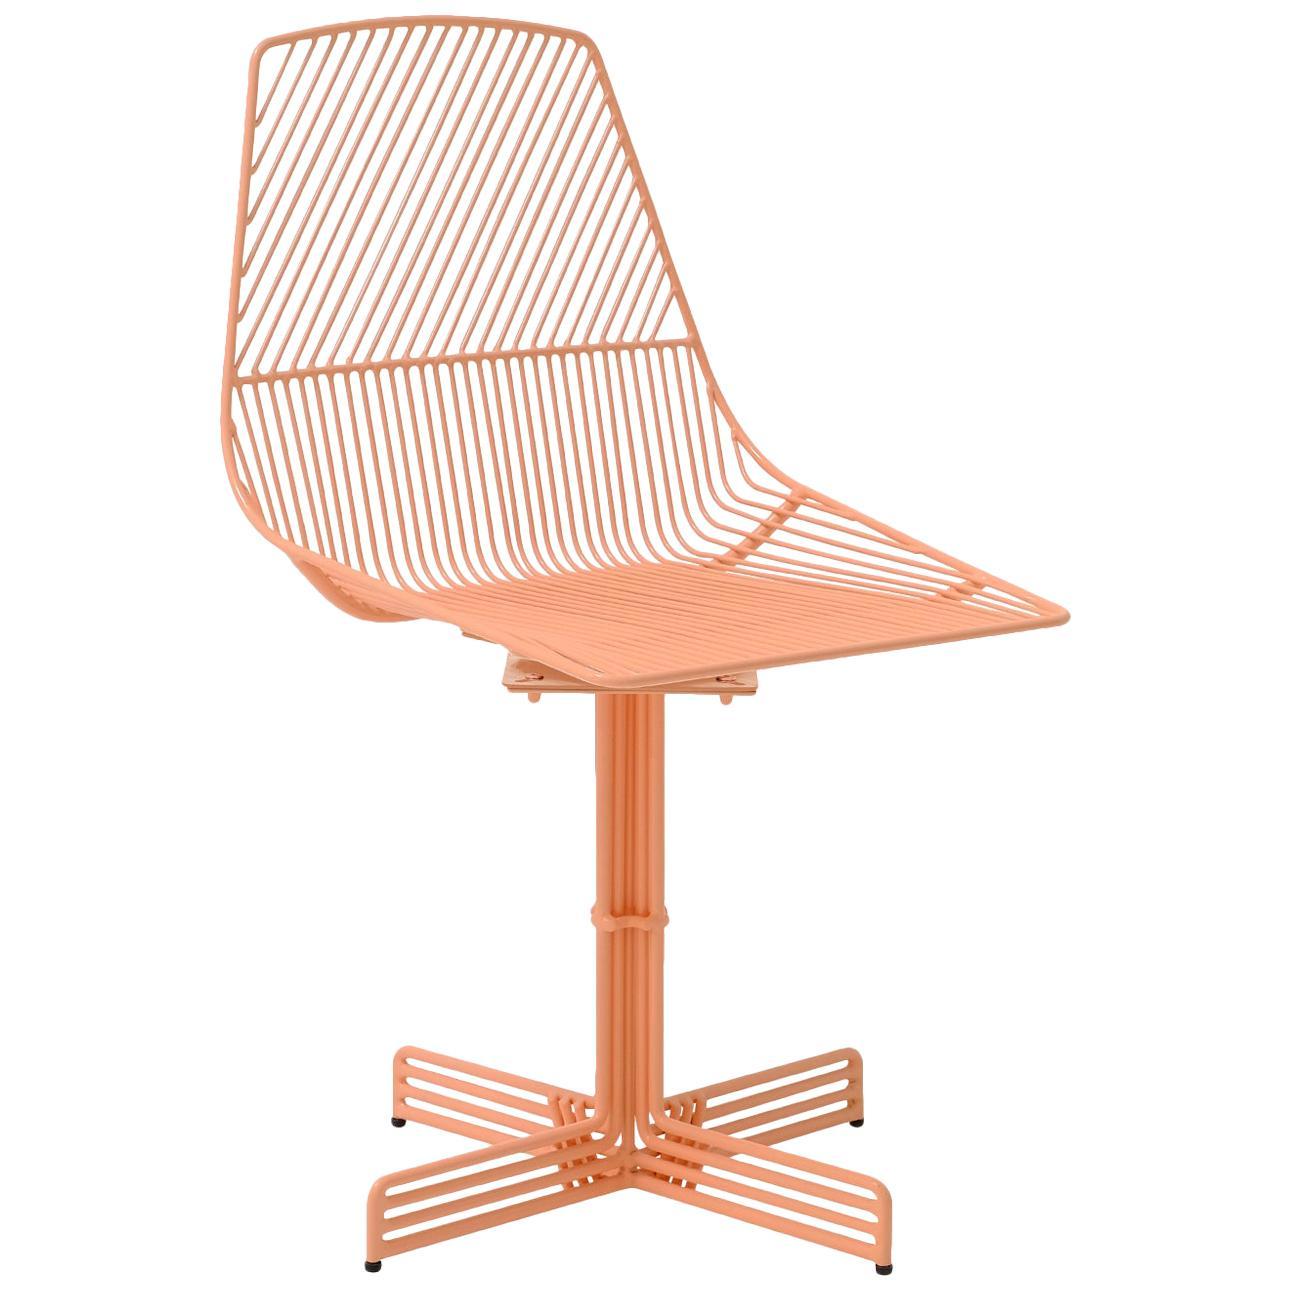 "Swivel Chair ""Swivel Ethel"" in Peachy Pink by Bend Goods"